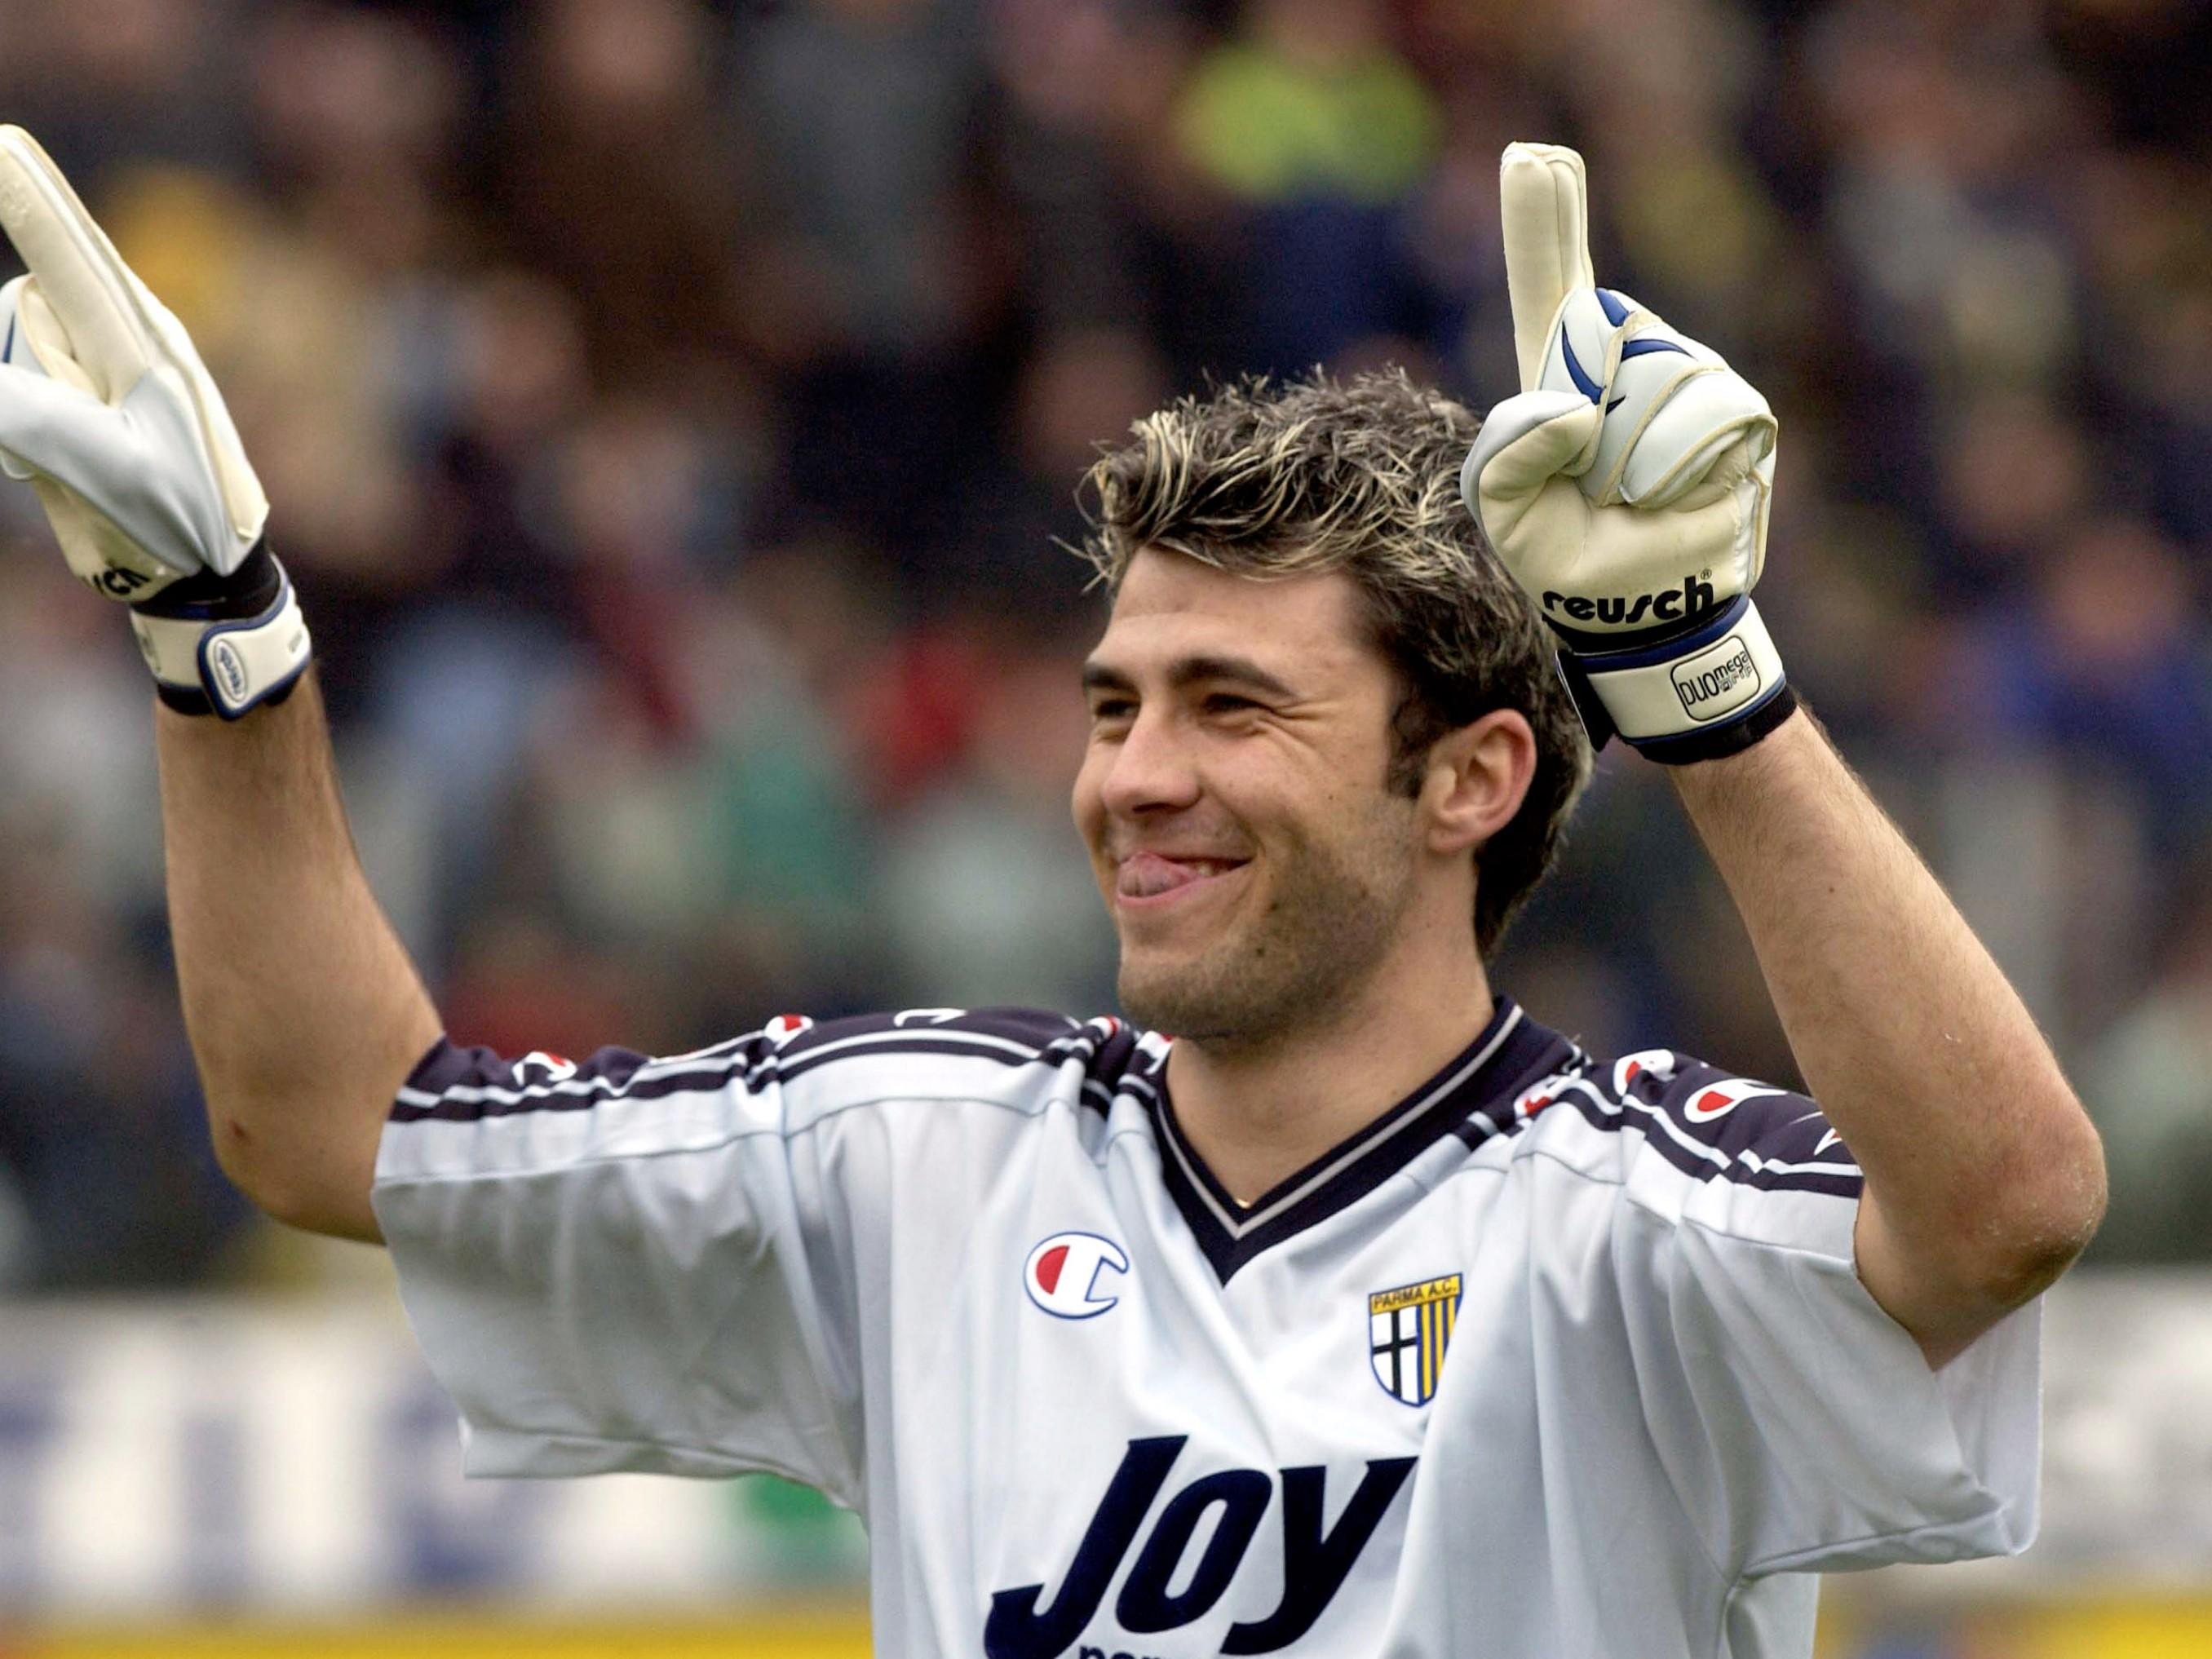 Parma-v-UdineseX-1562860915.jpg